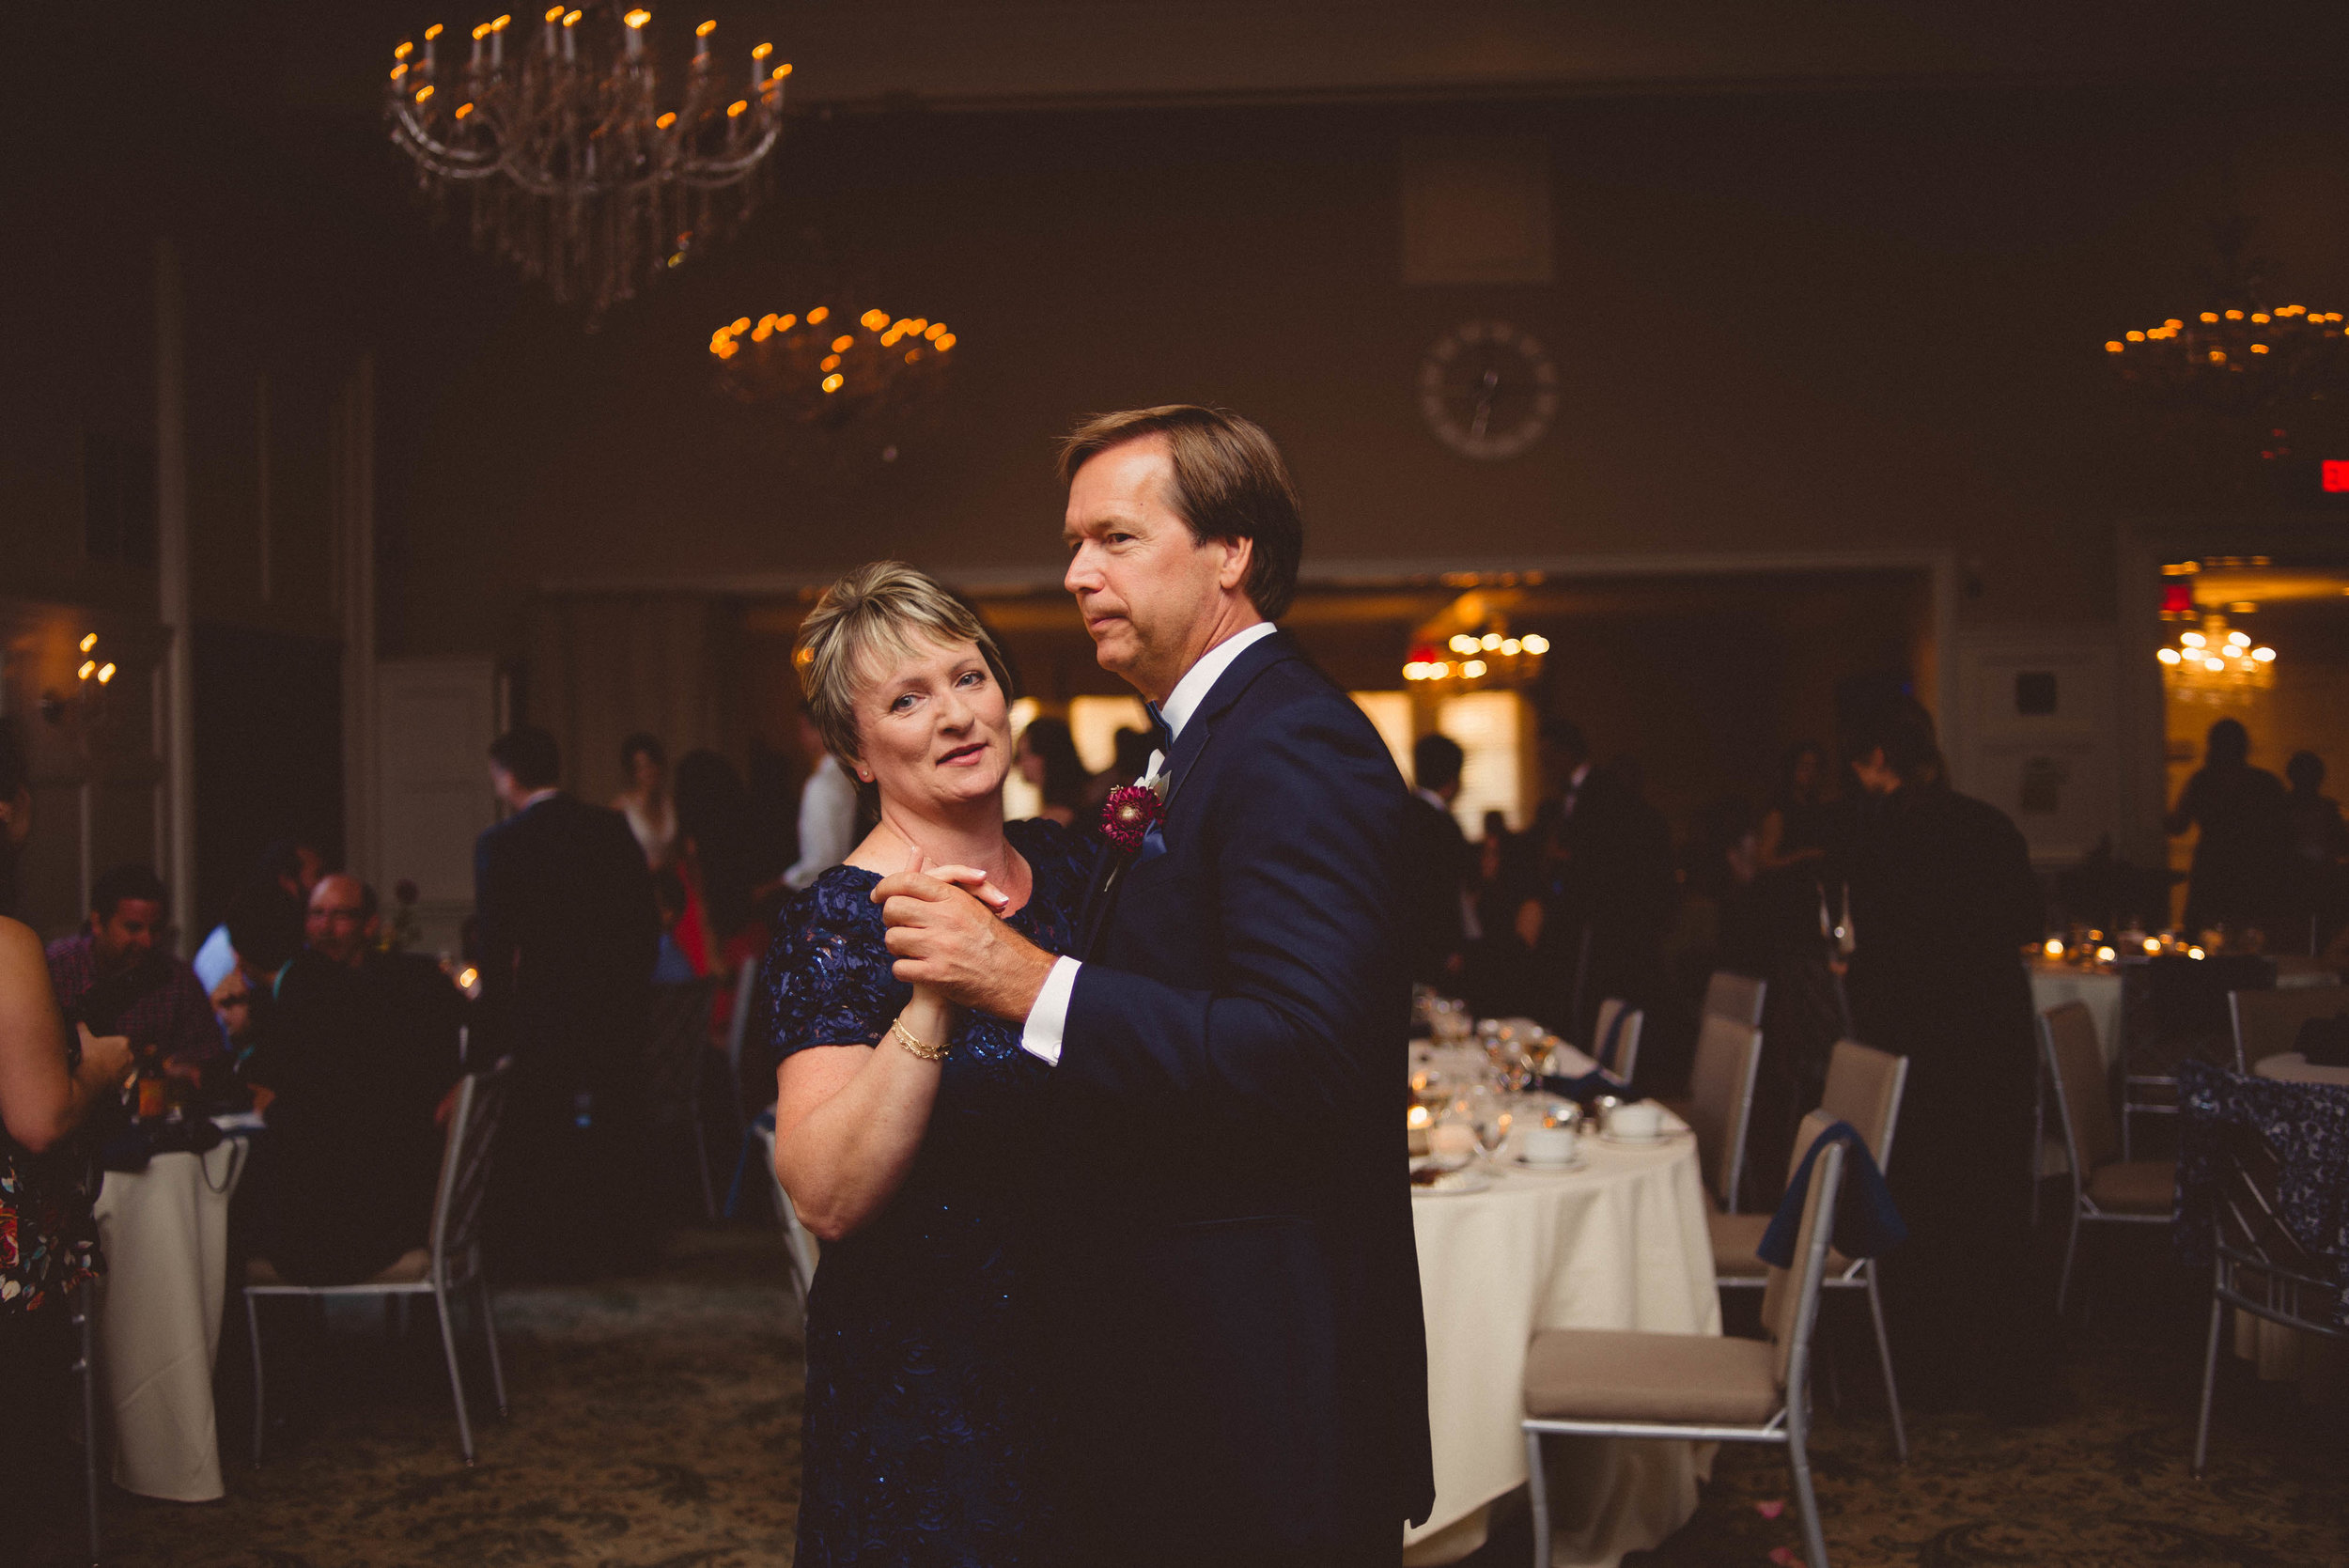 Kara and Mike Wedding-20160904-19-33-02.jpg